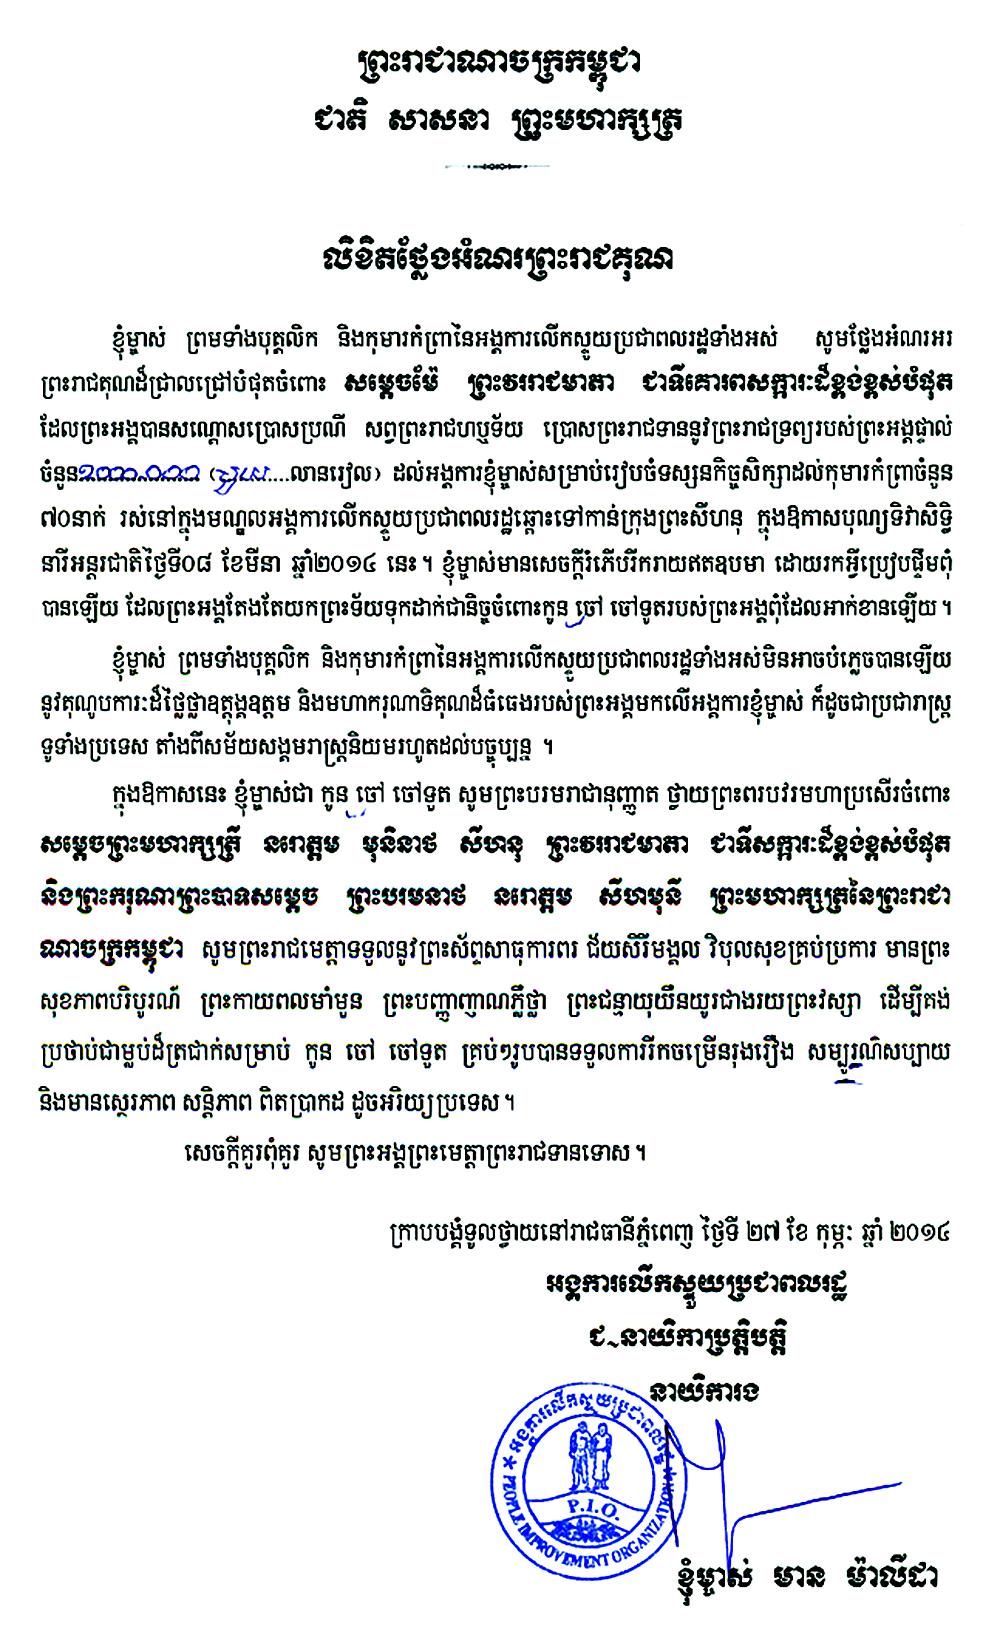 All/correspondance/CorrespondancePrive/2014/Fvrier/id1586/photo001.jpg